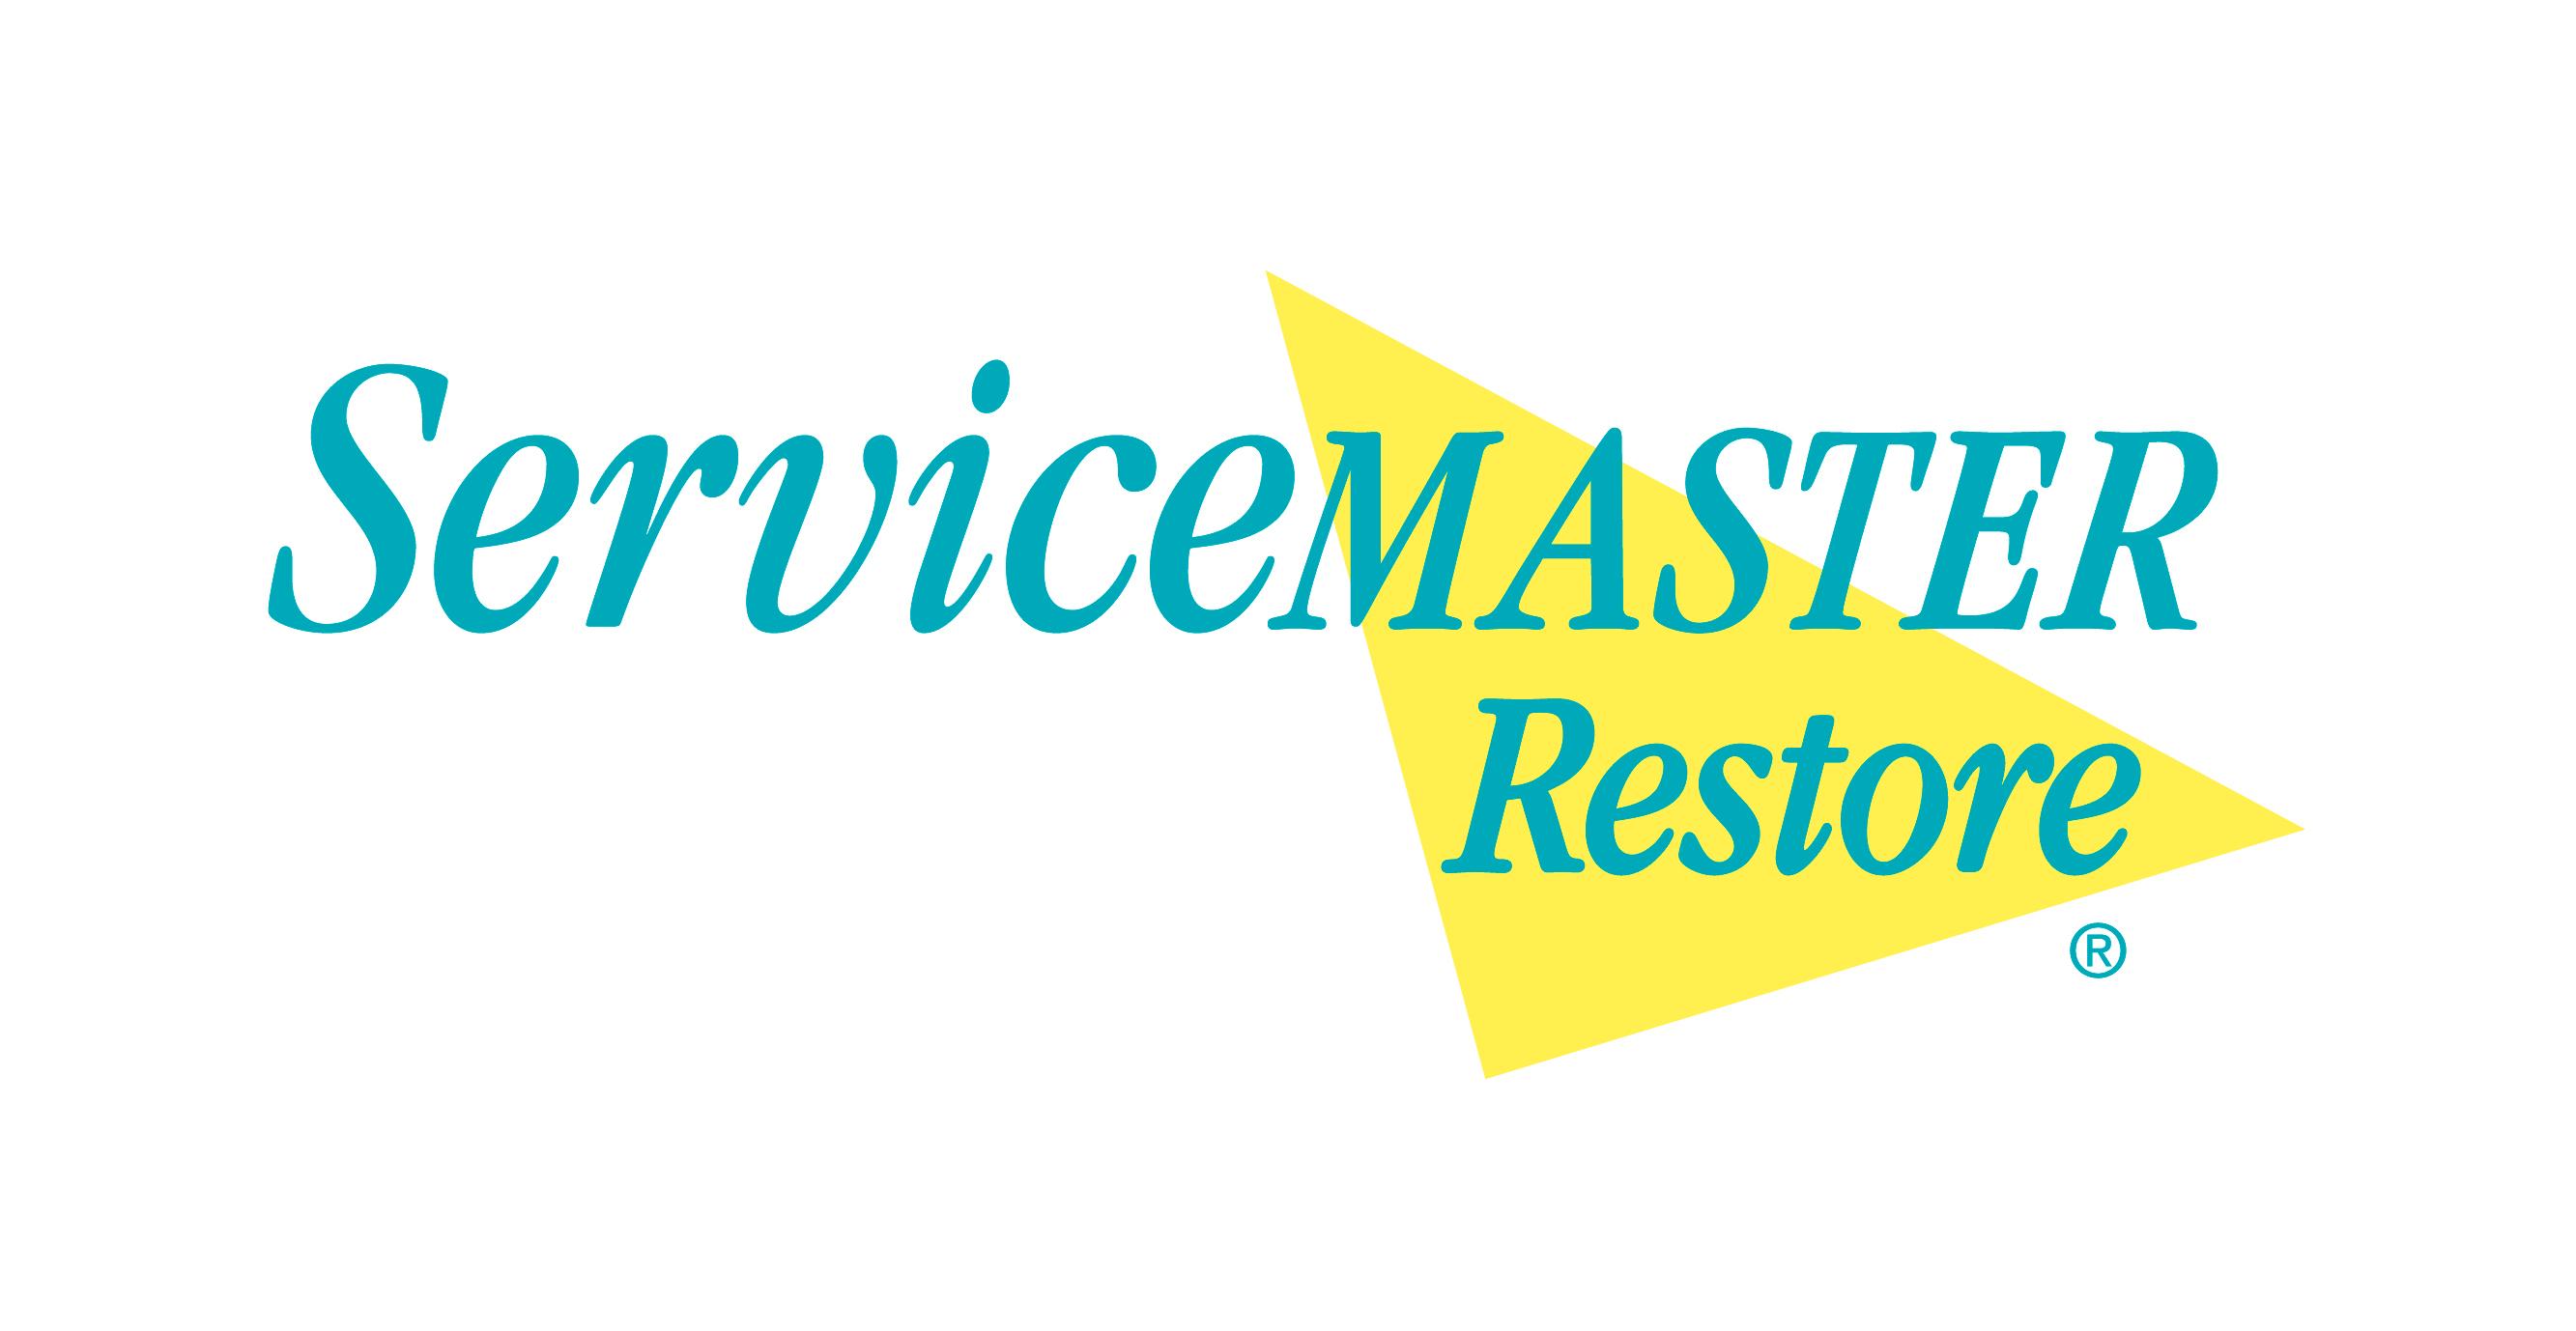 ServiceMaster Restoration by Advanced - Erie, PA - Water & Fire Damage Restoration